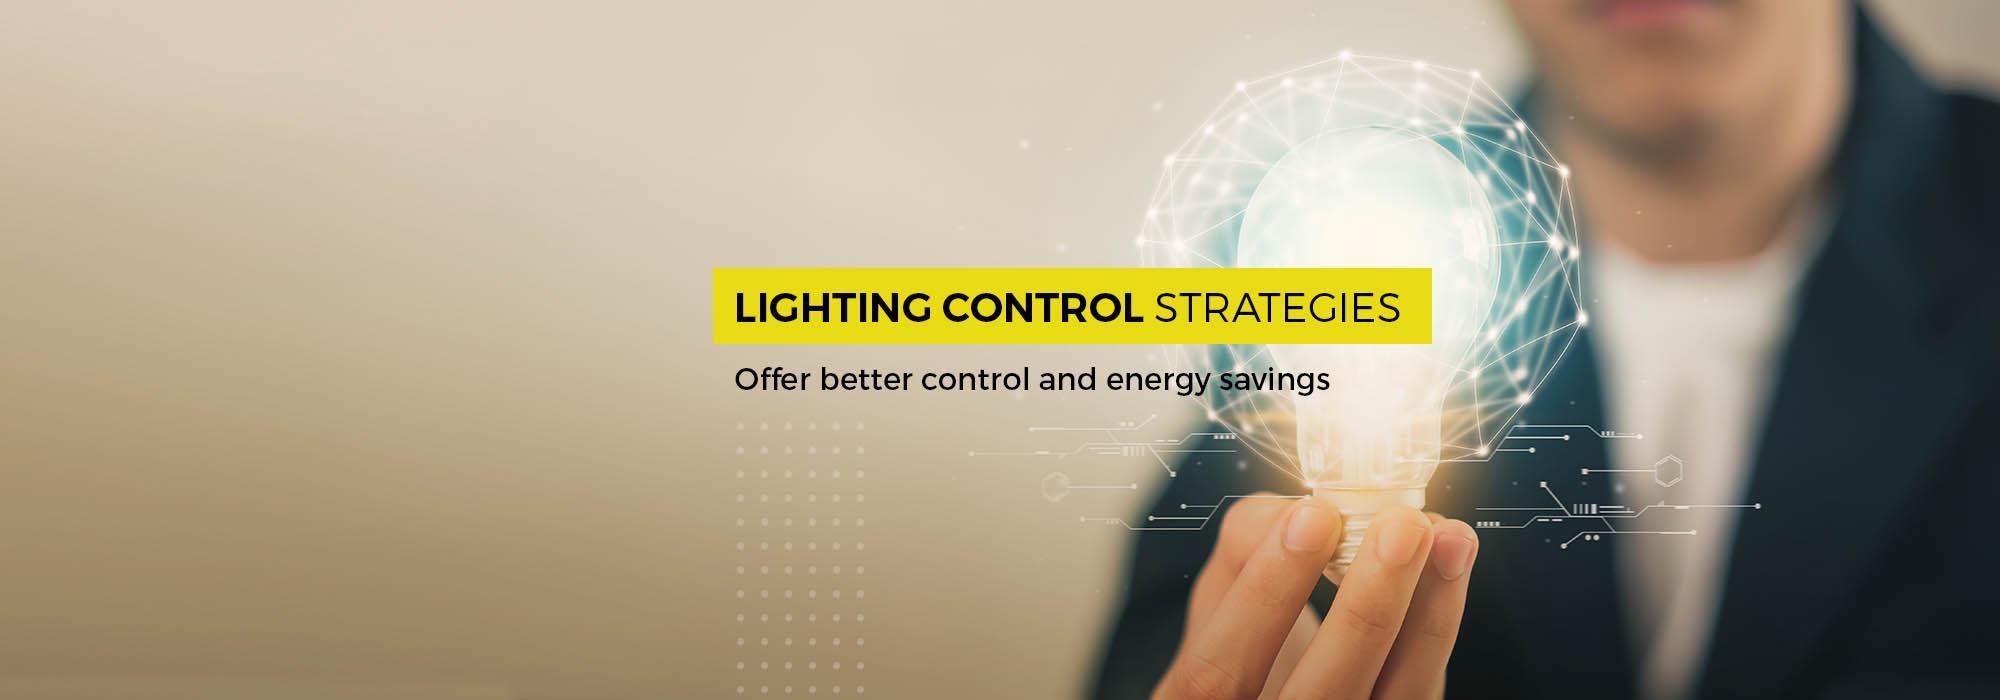 Best lighting control strategies